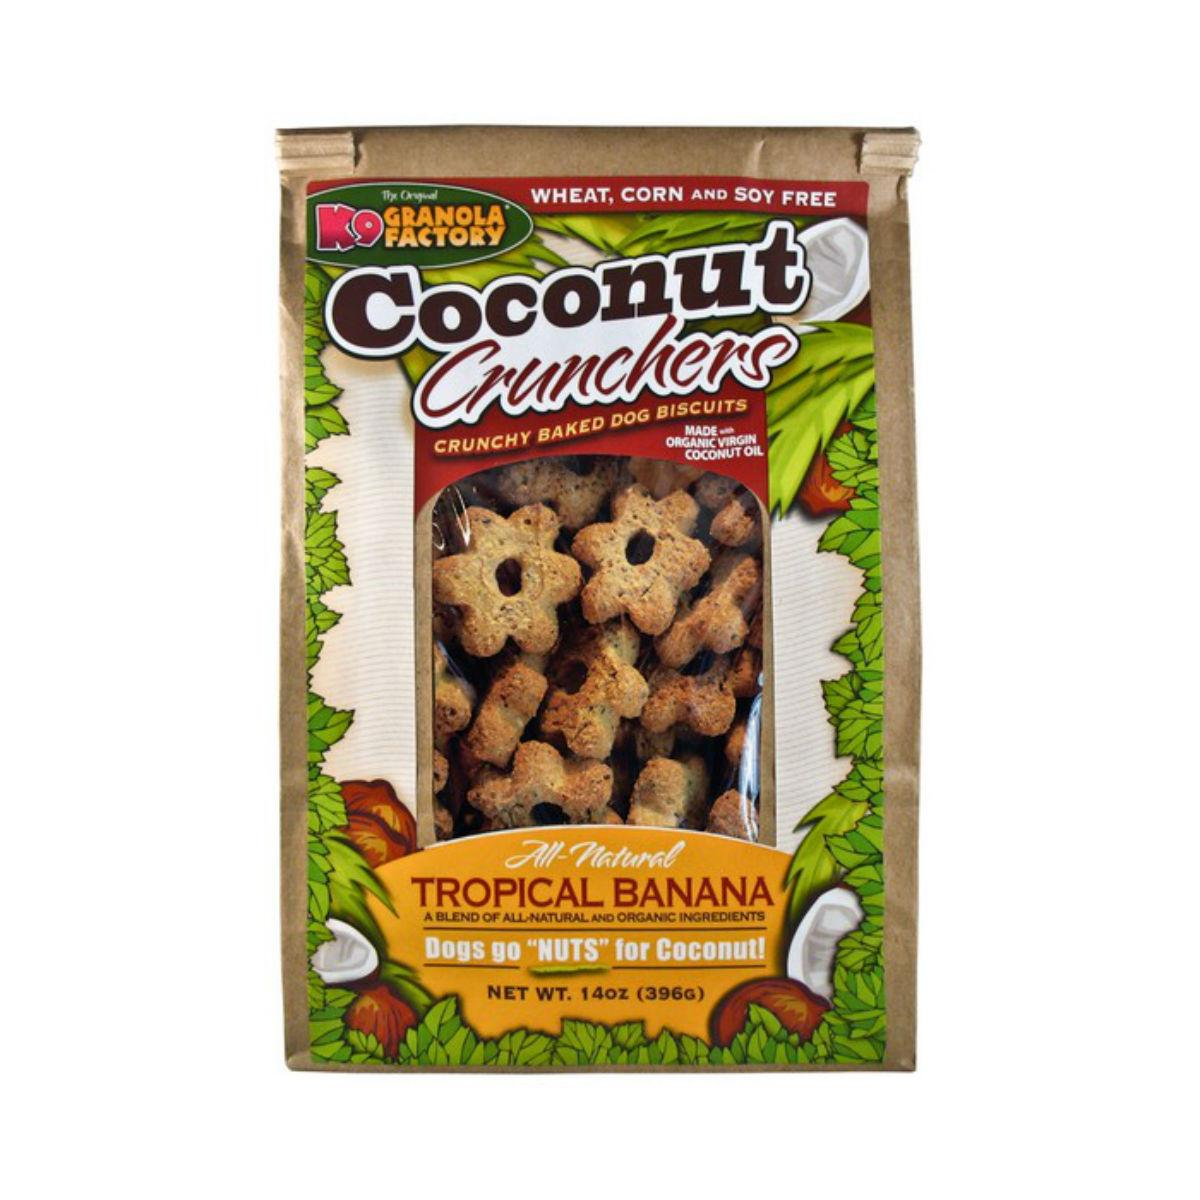 K9 Granola Factory Coconut Crunchers Dog Treat - Tropical Banana